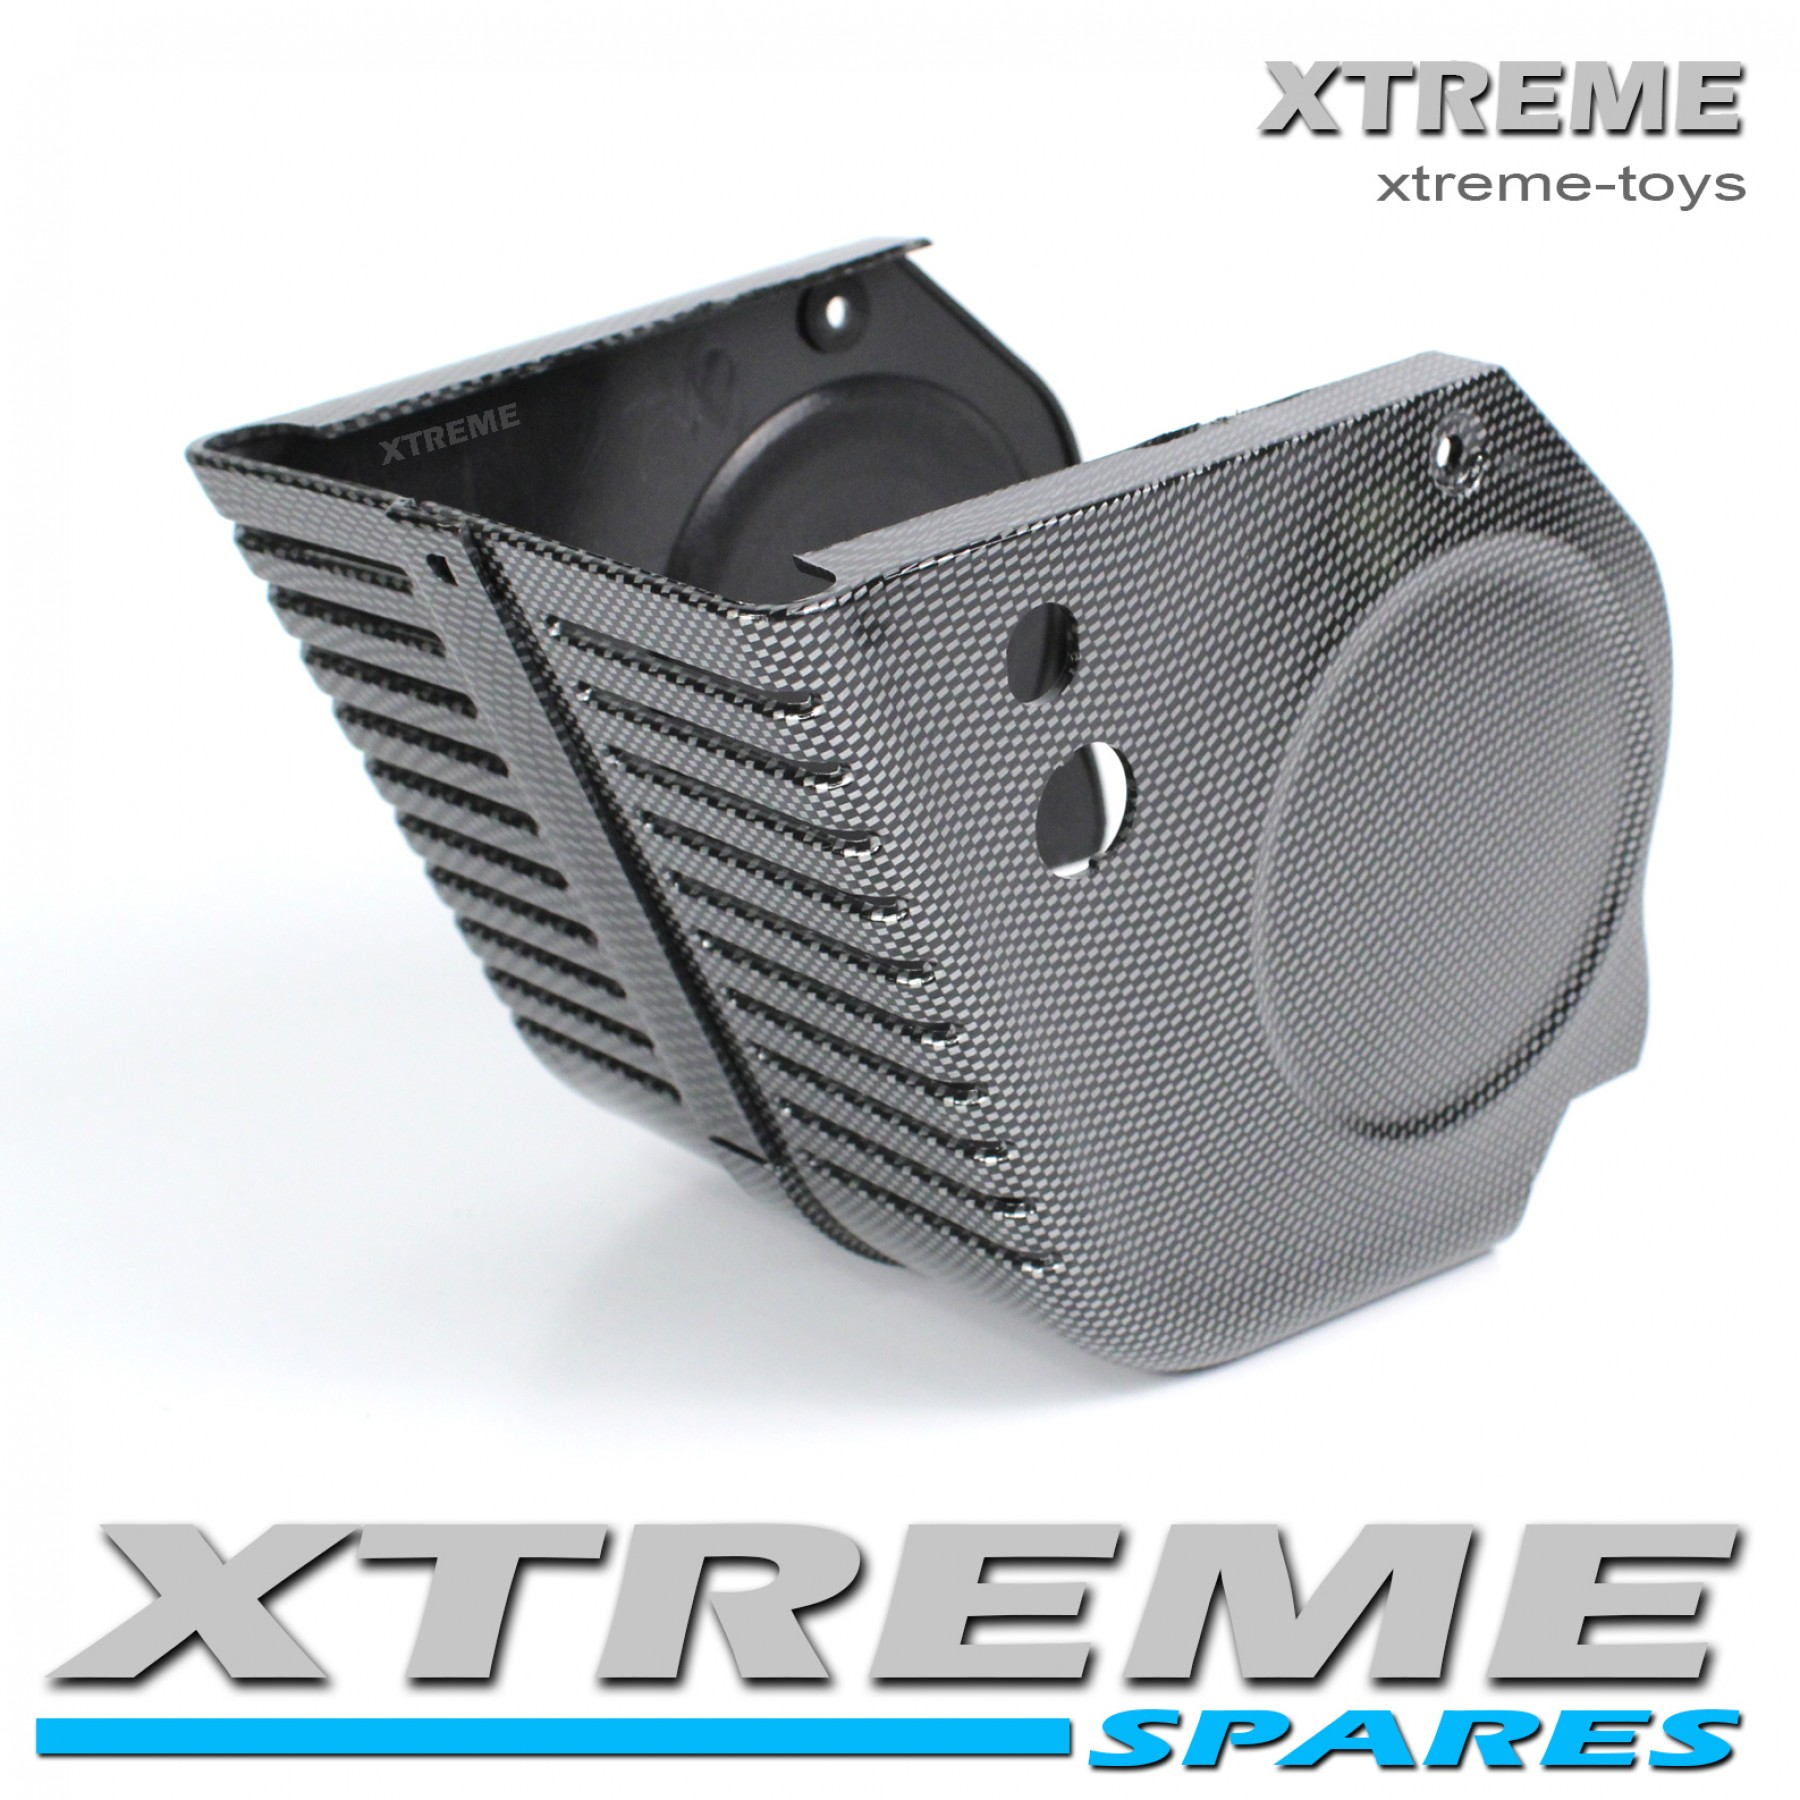 MINI XTM DIRT BIKE PLASTIC MOTOR CASE